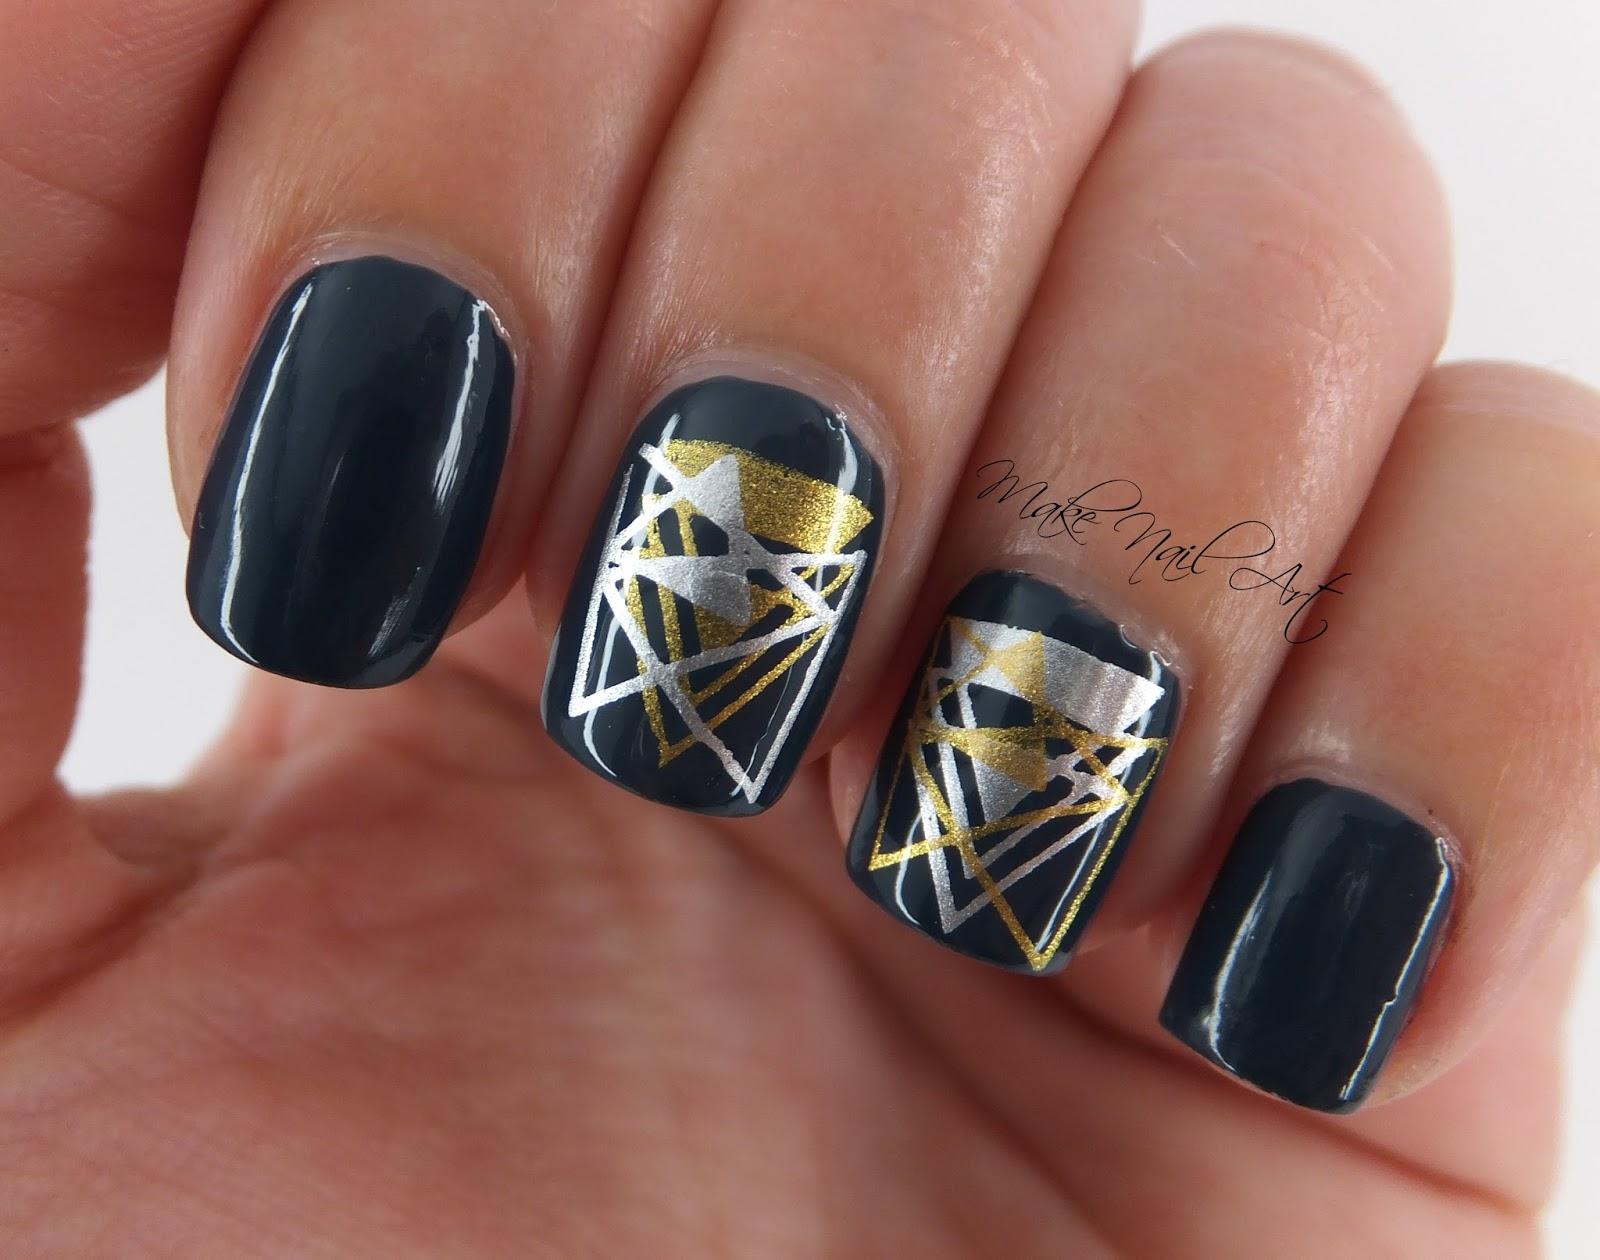 Stamping nail art tutorial gallery nail art and nail design ideas make nail art geometric stamping nails nail art tutorial then i stamped one of the images prinsesfo Gallery